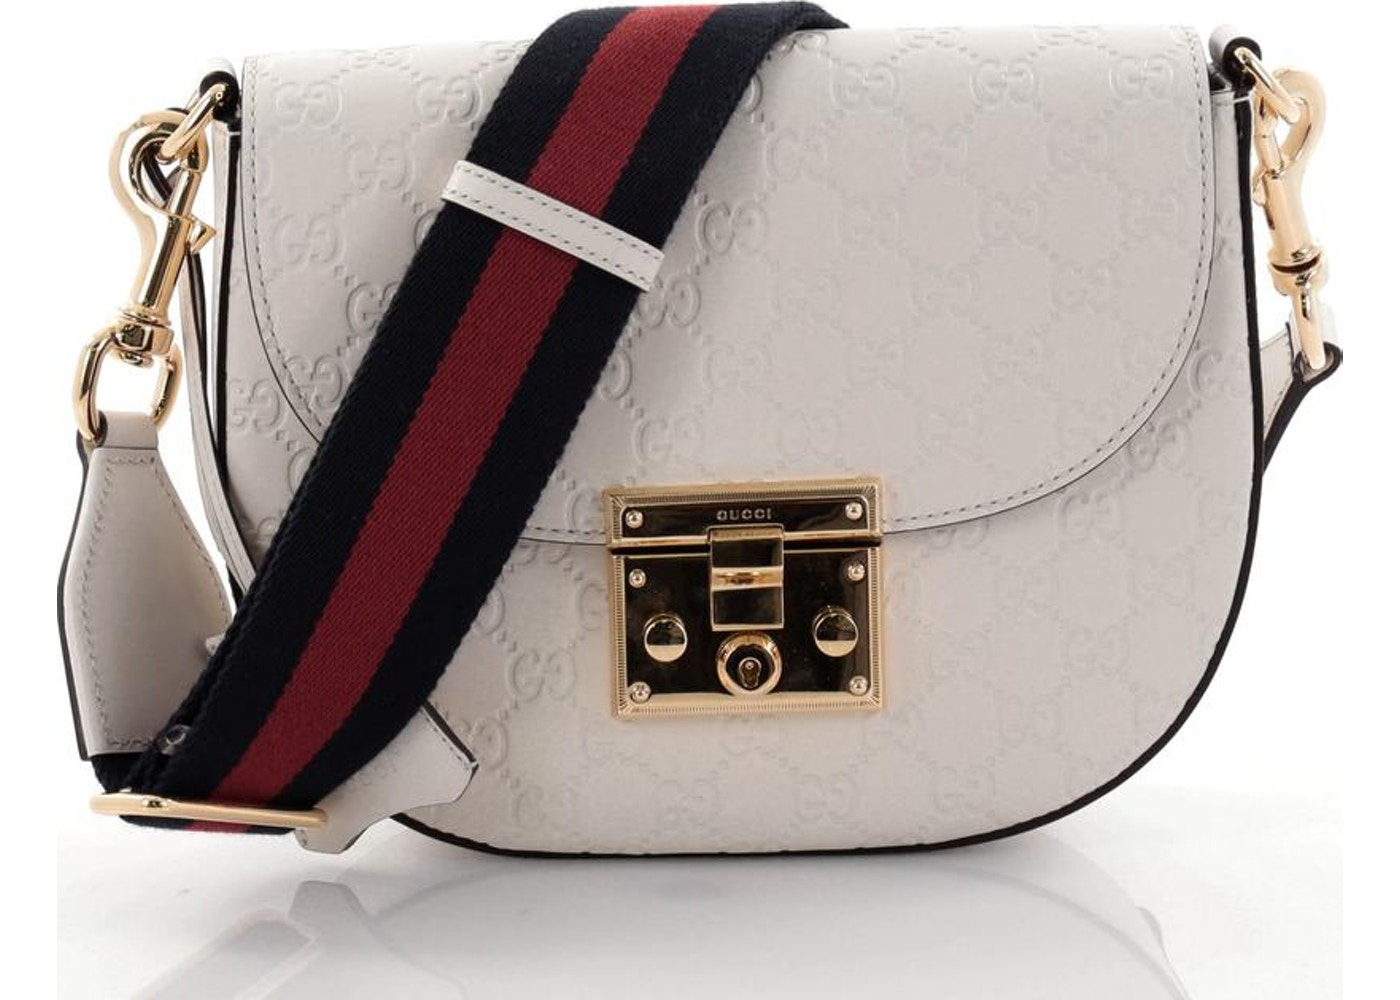 e4e767b1c978 Gucci Padlock Saddle Shoulder Bag Monogram Guccissima Medium Off White Black Red.  Monogram Guccissima Medium Off White Black Red